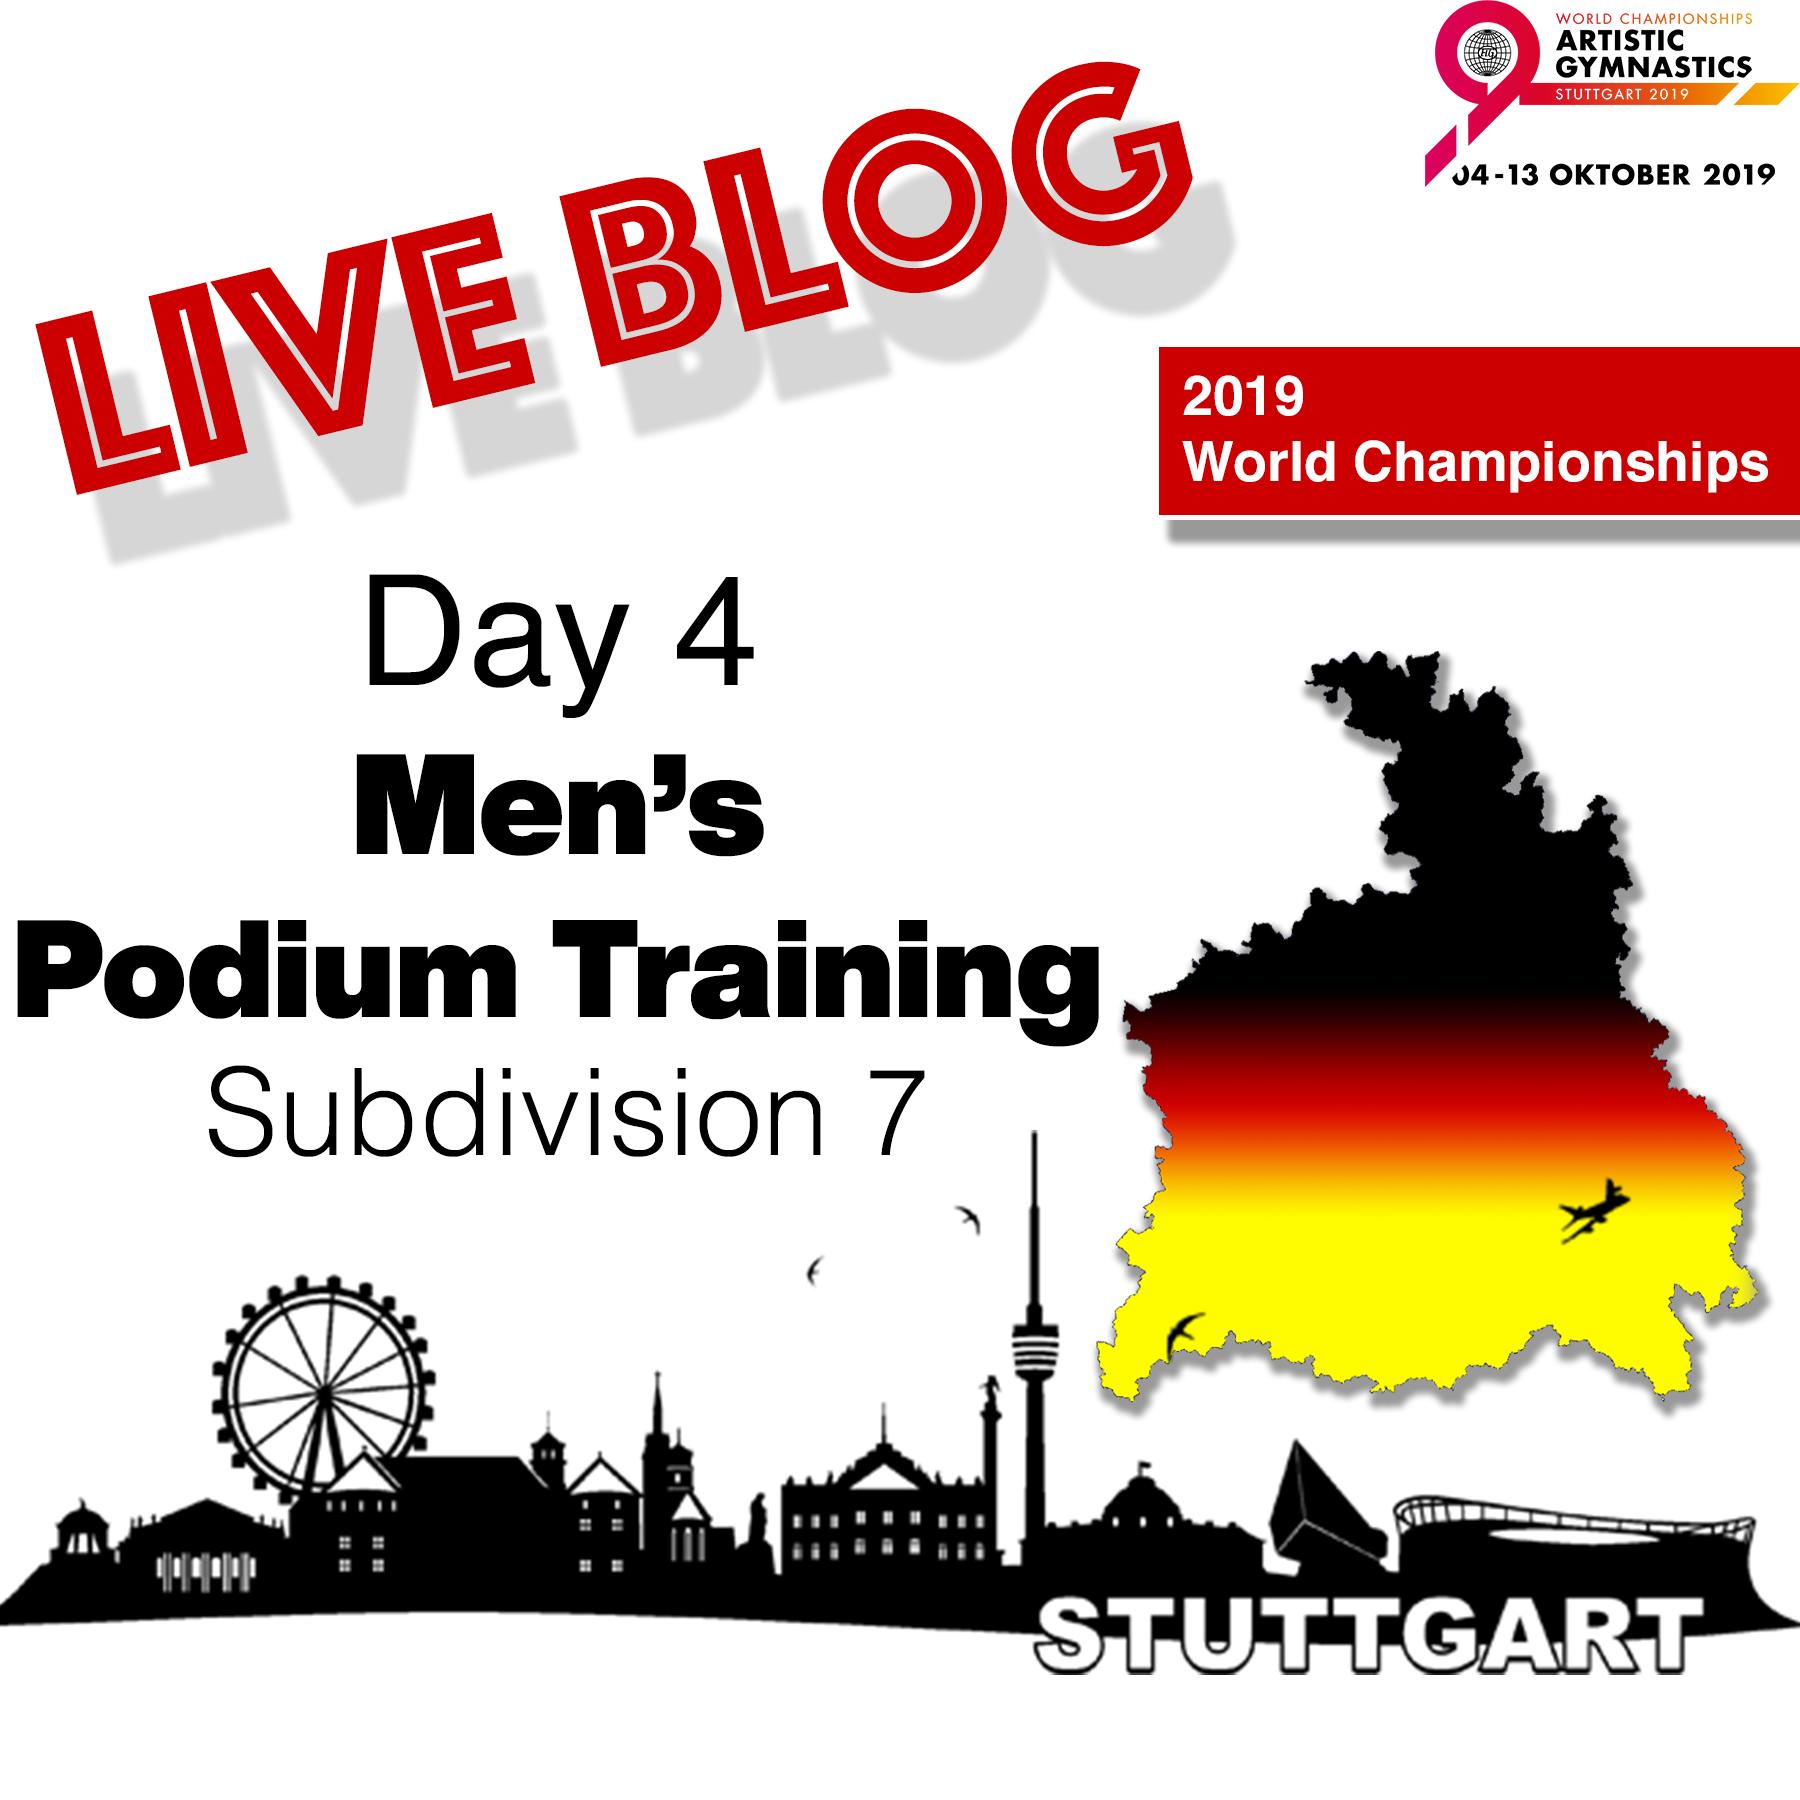 Live Blog: 2019 World Championships – MAG Podium Training – Sub Division 7, Oct. 3rd